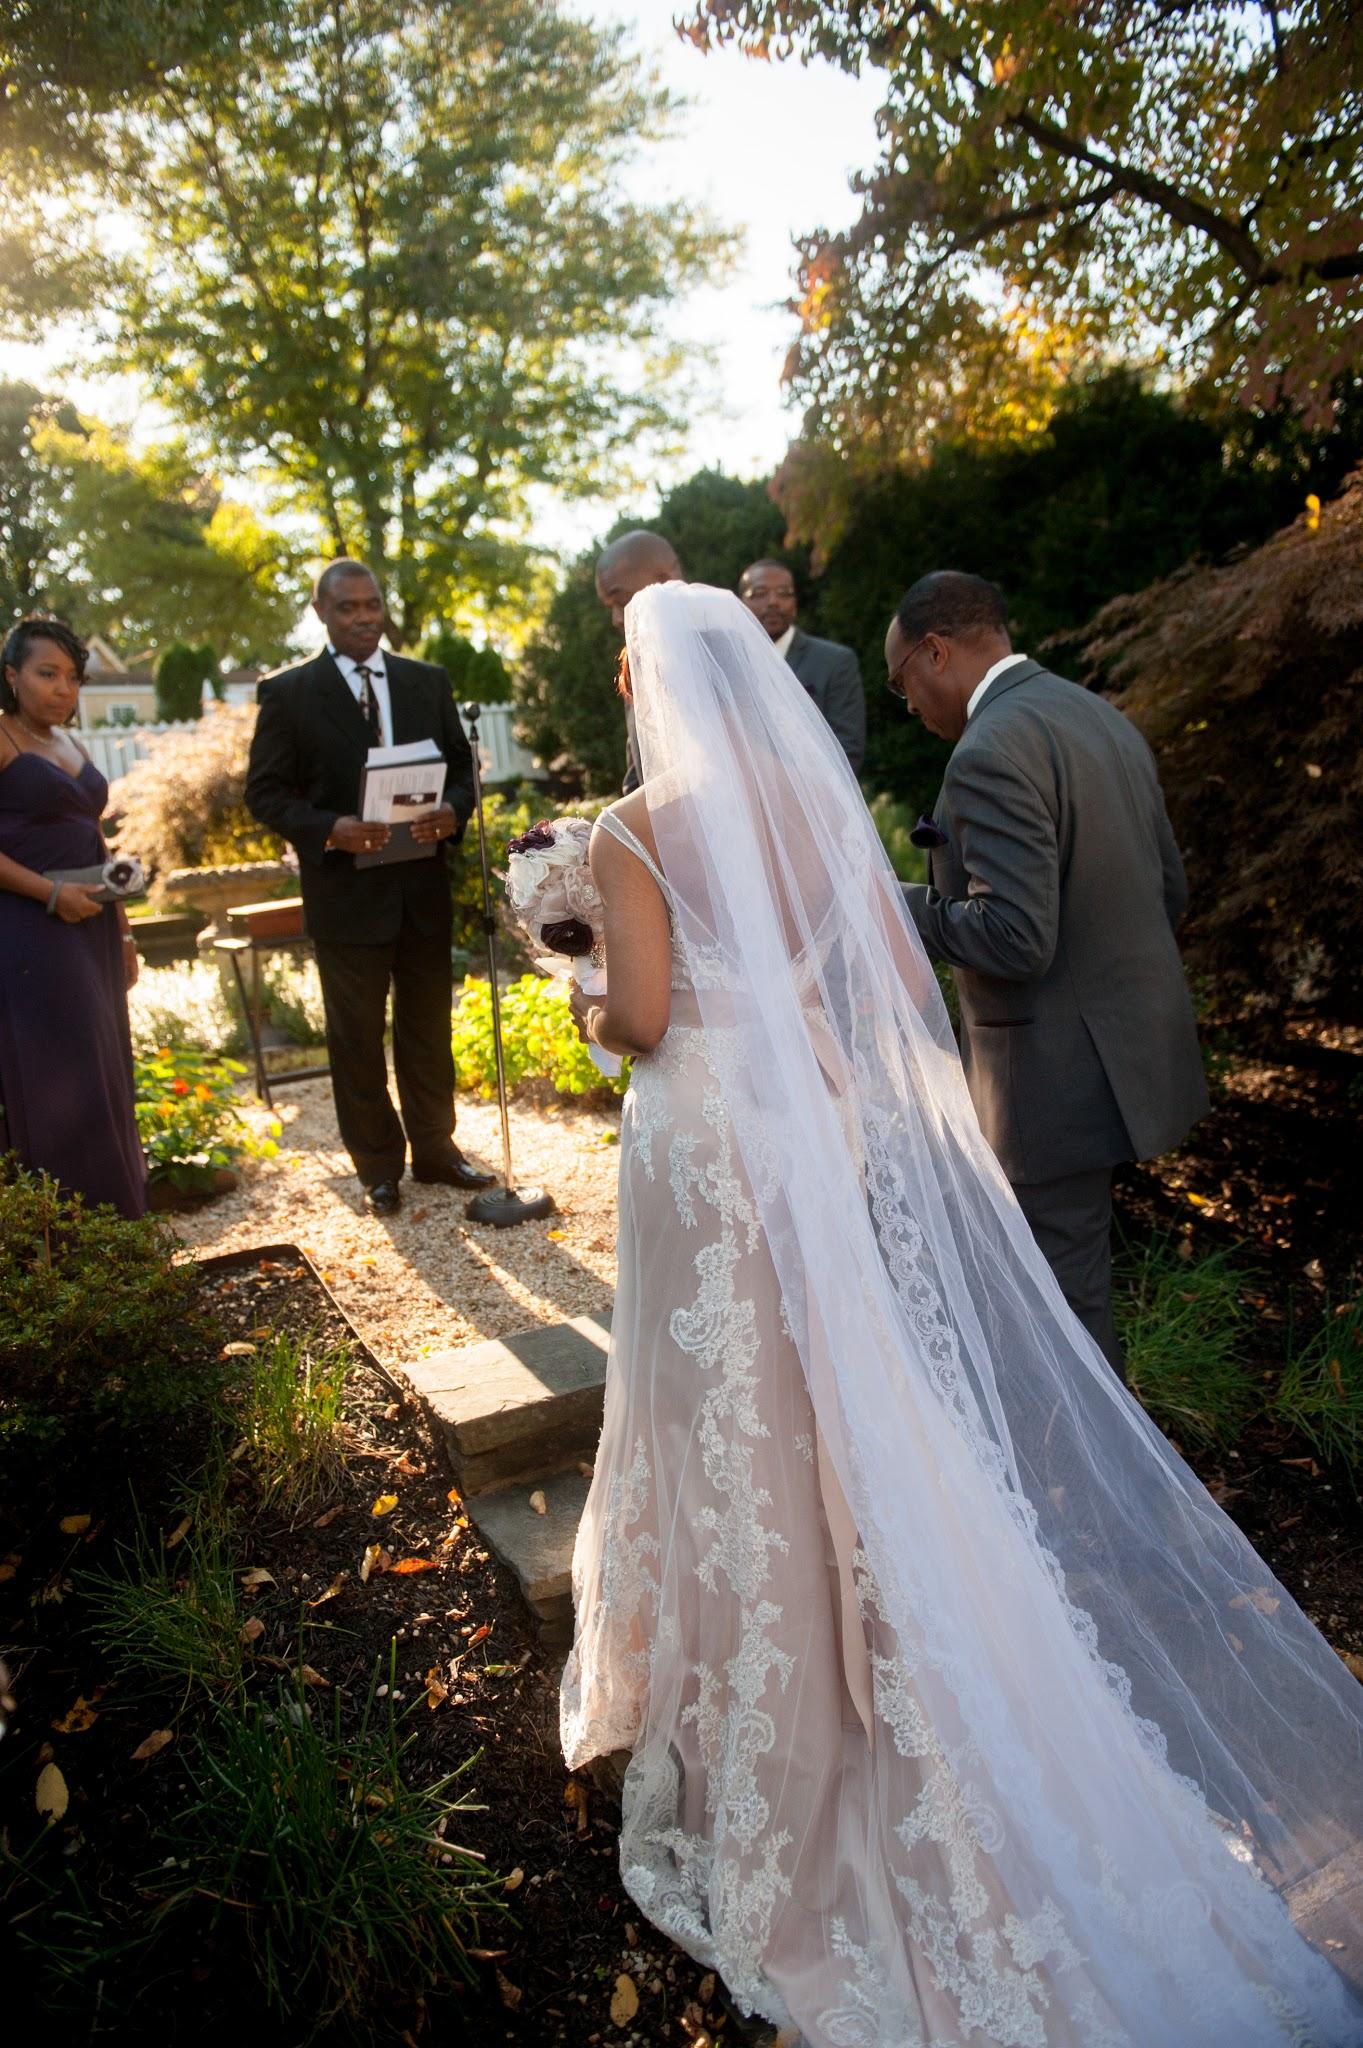 247.Dex-Stacia wedding edits0247.jpg